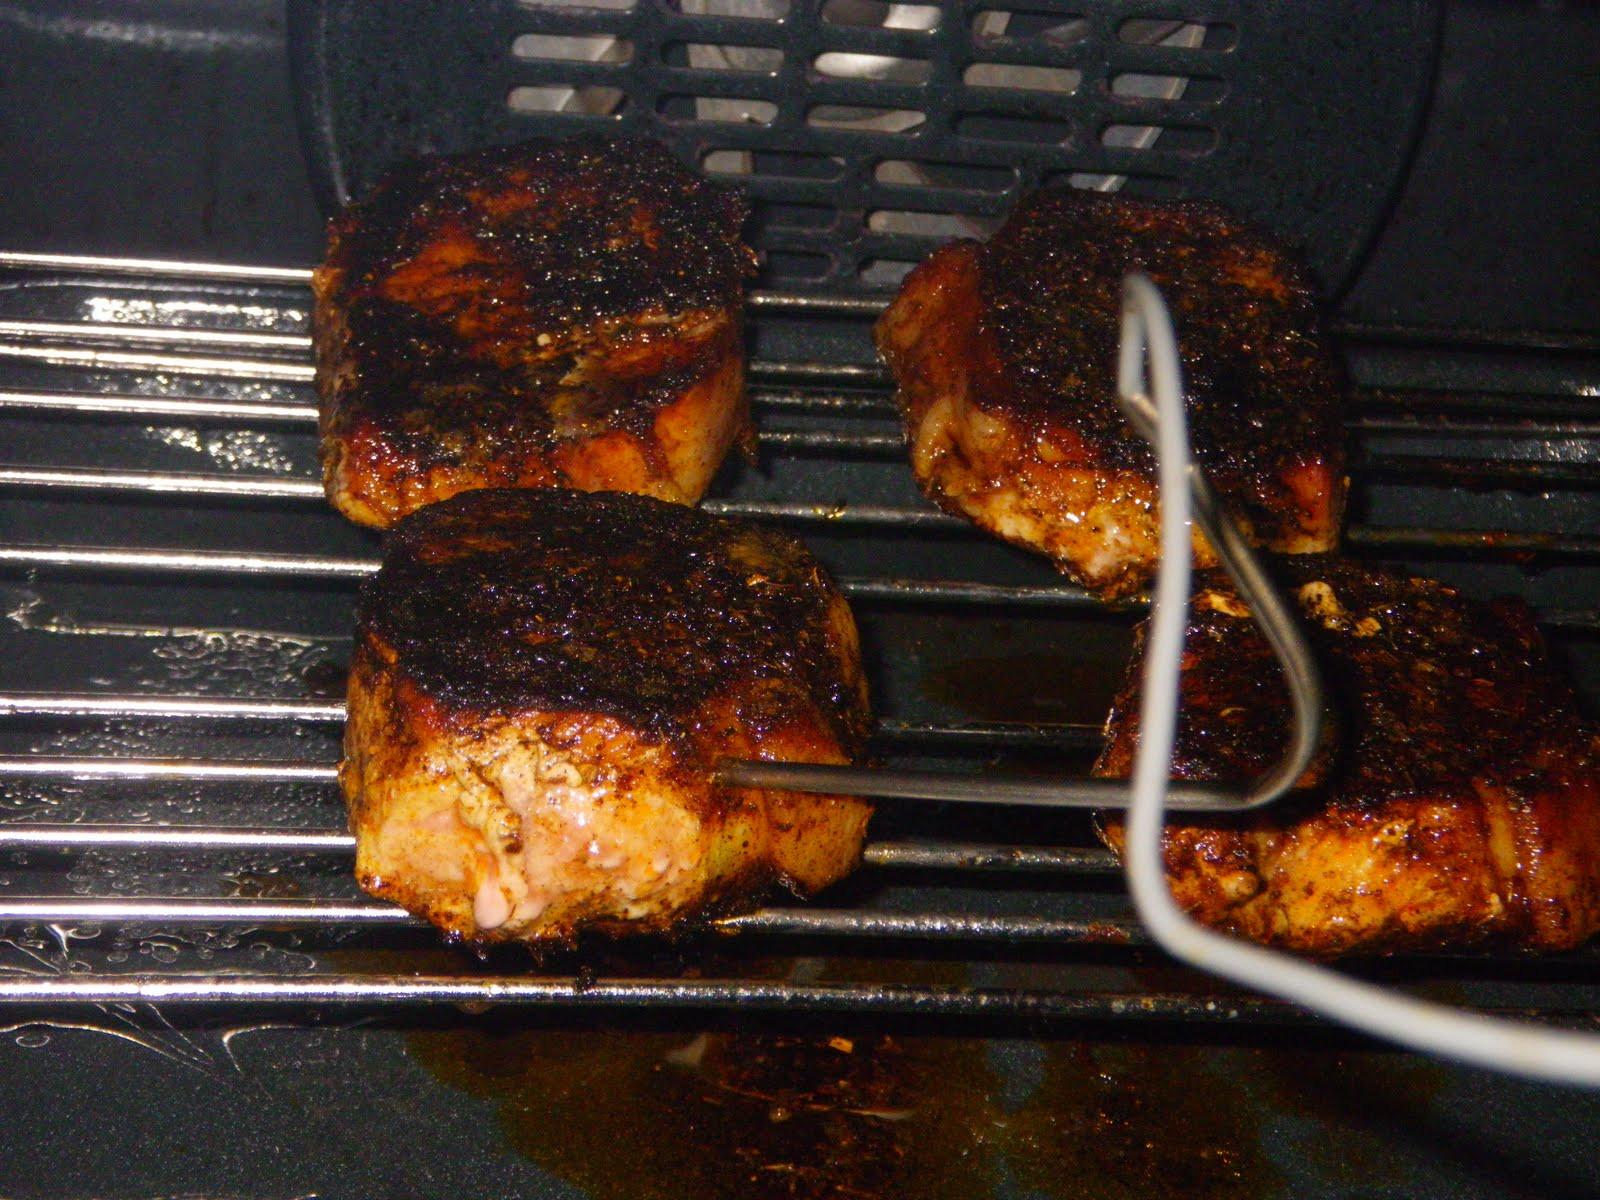 What Temperature To Bake Pork Chops  Temperature For Baking Pork Loin Chops